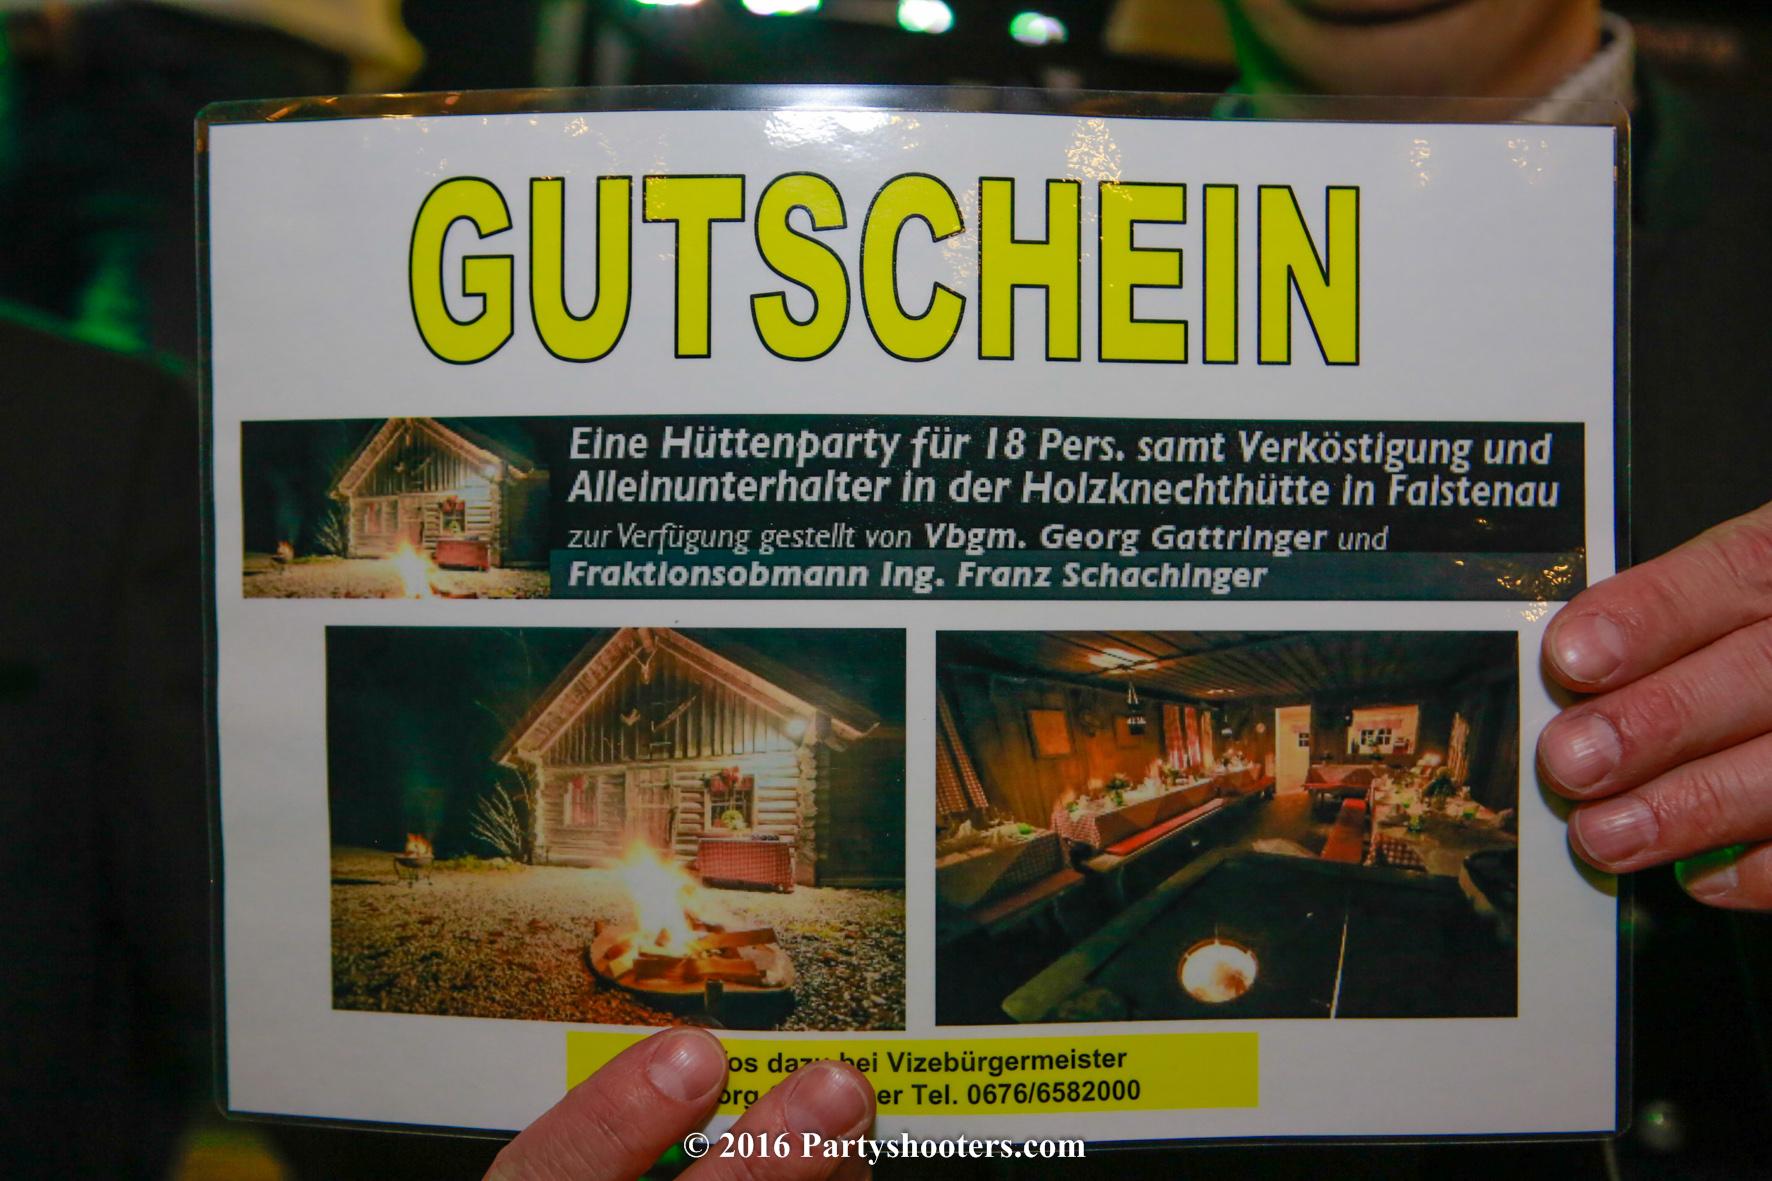 0103 - 4195 - Fruehlingsball Aspach